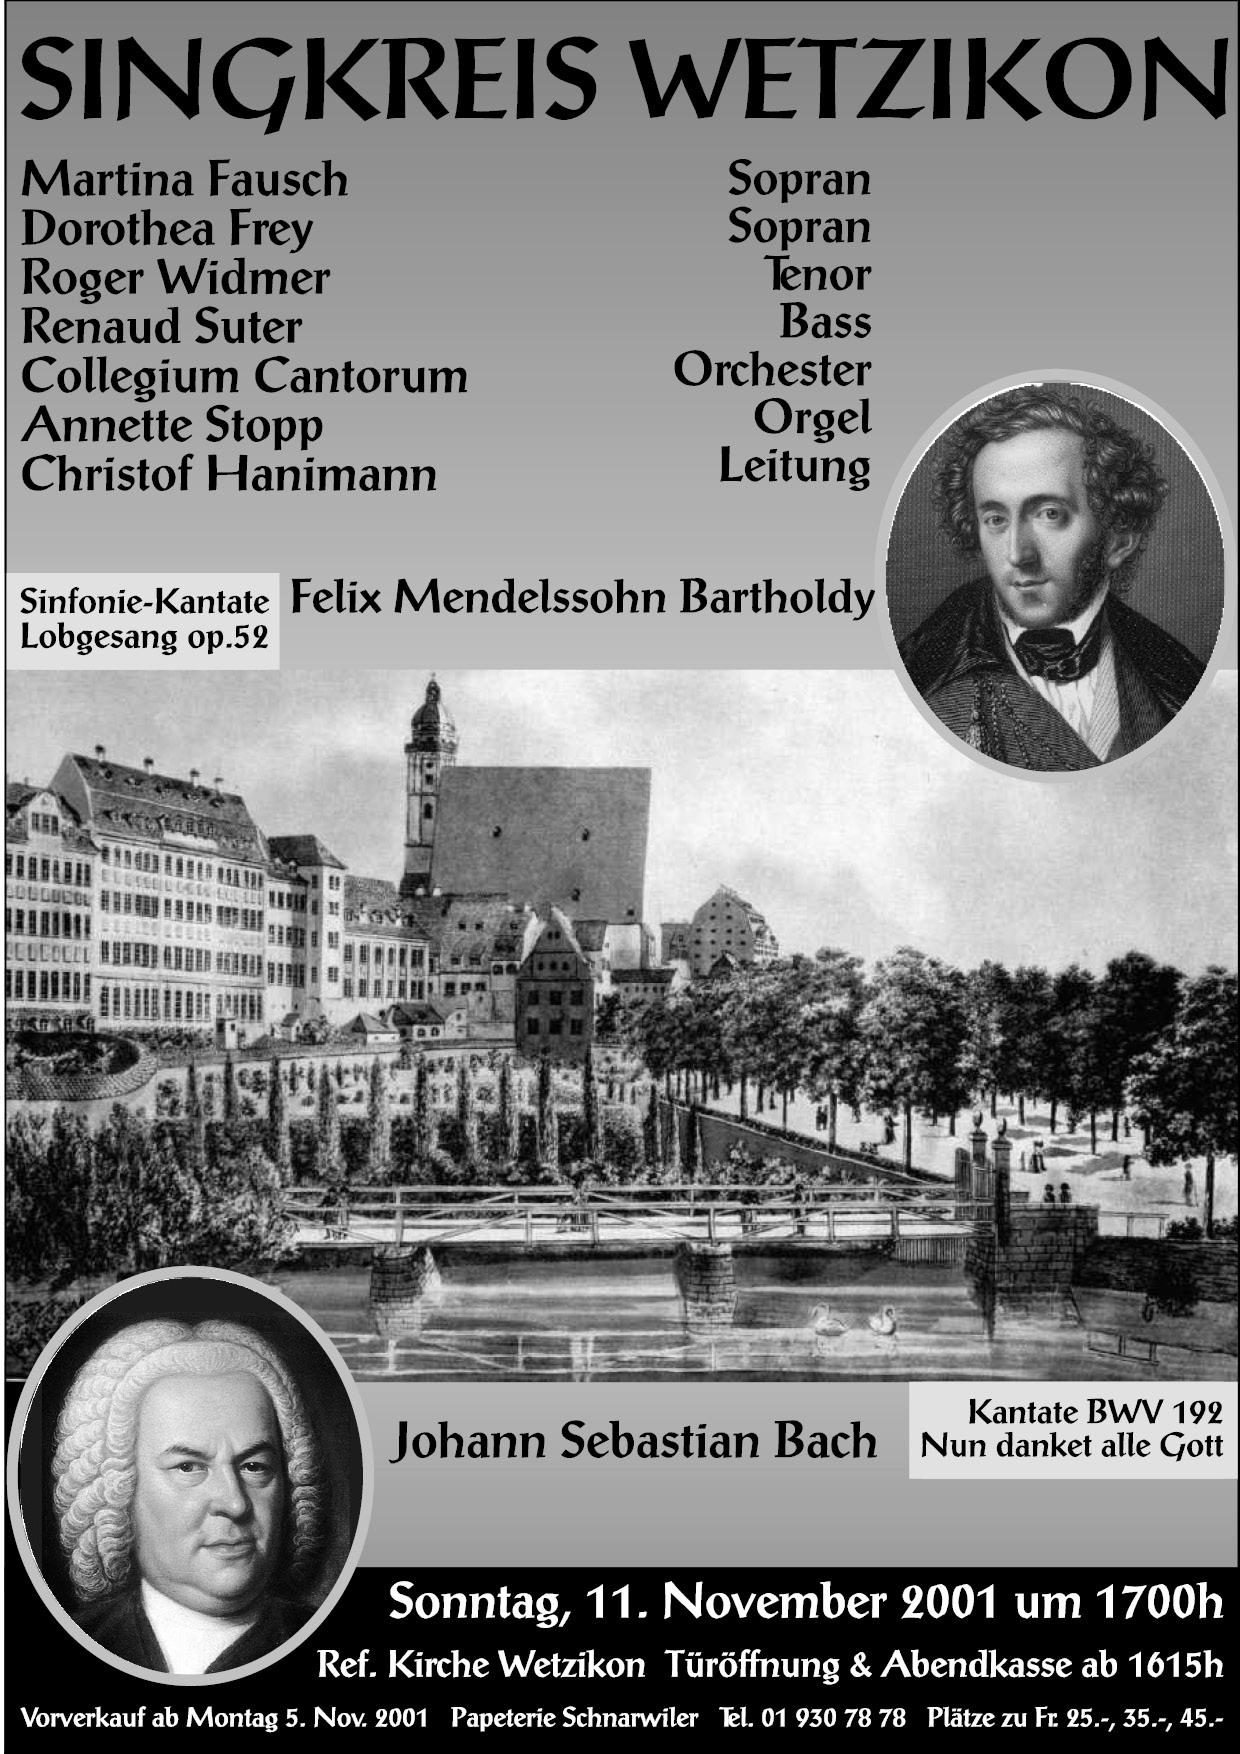 2001 MendelssohnBartholdy, J.S.Bach